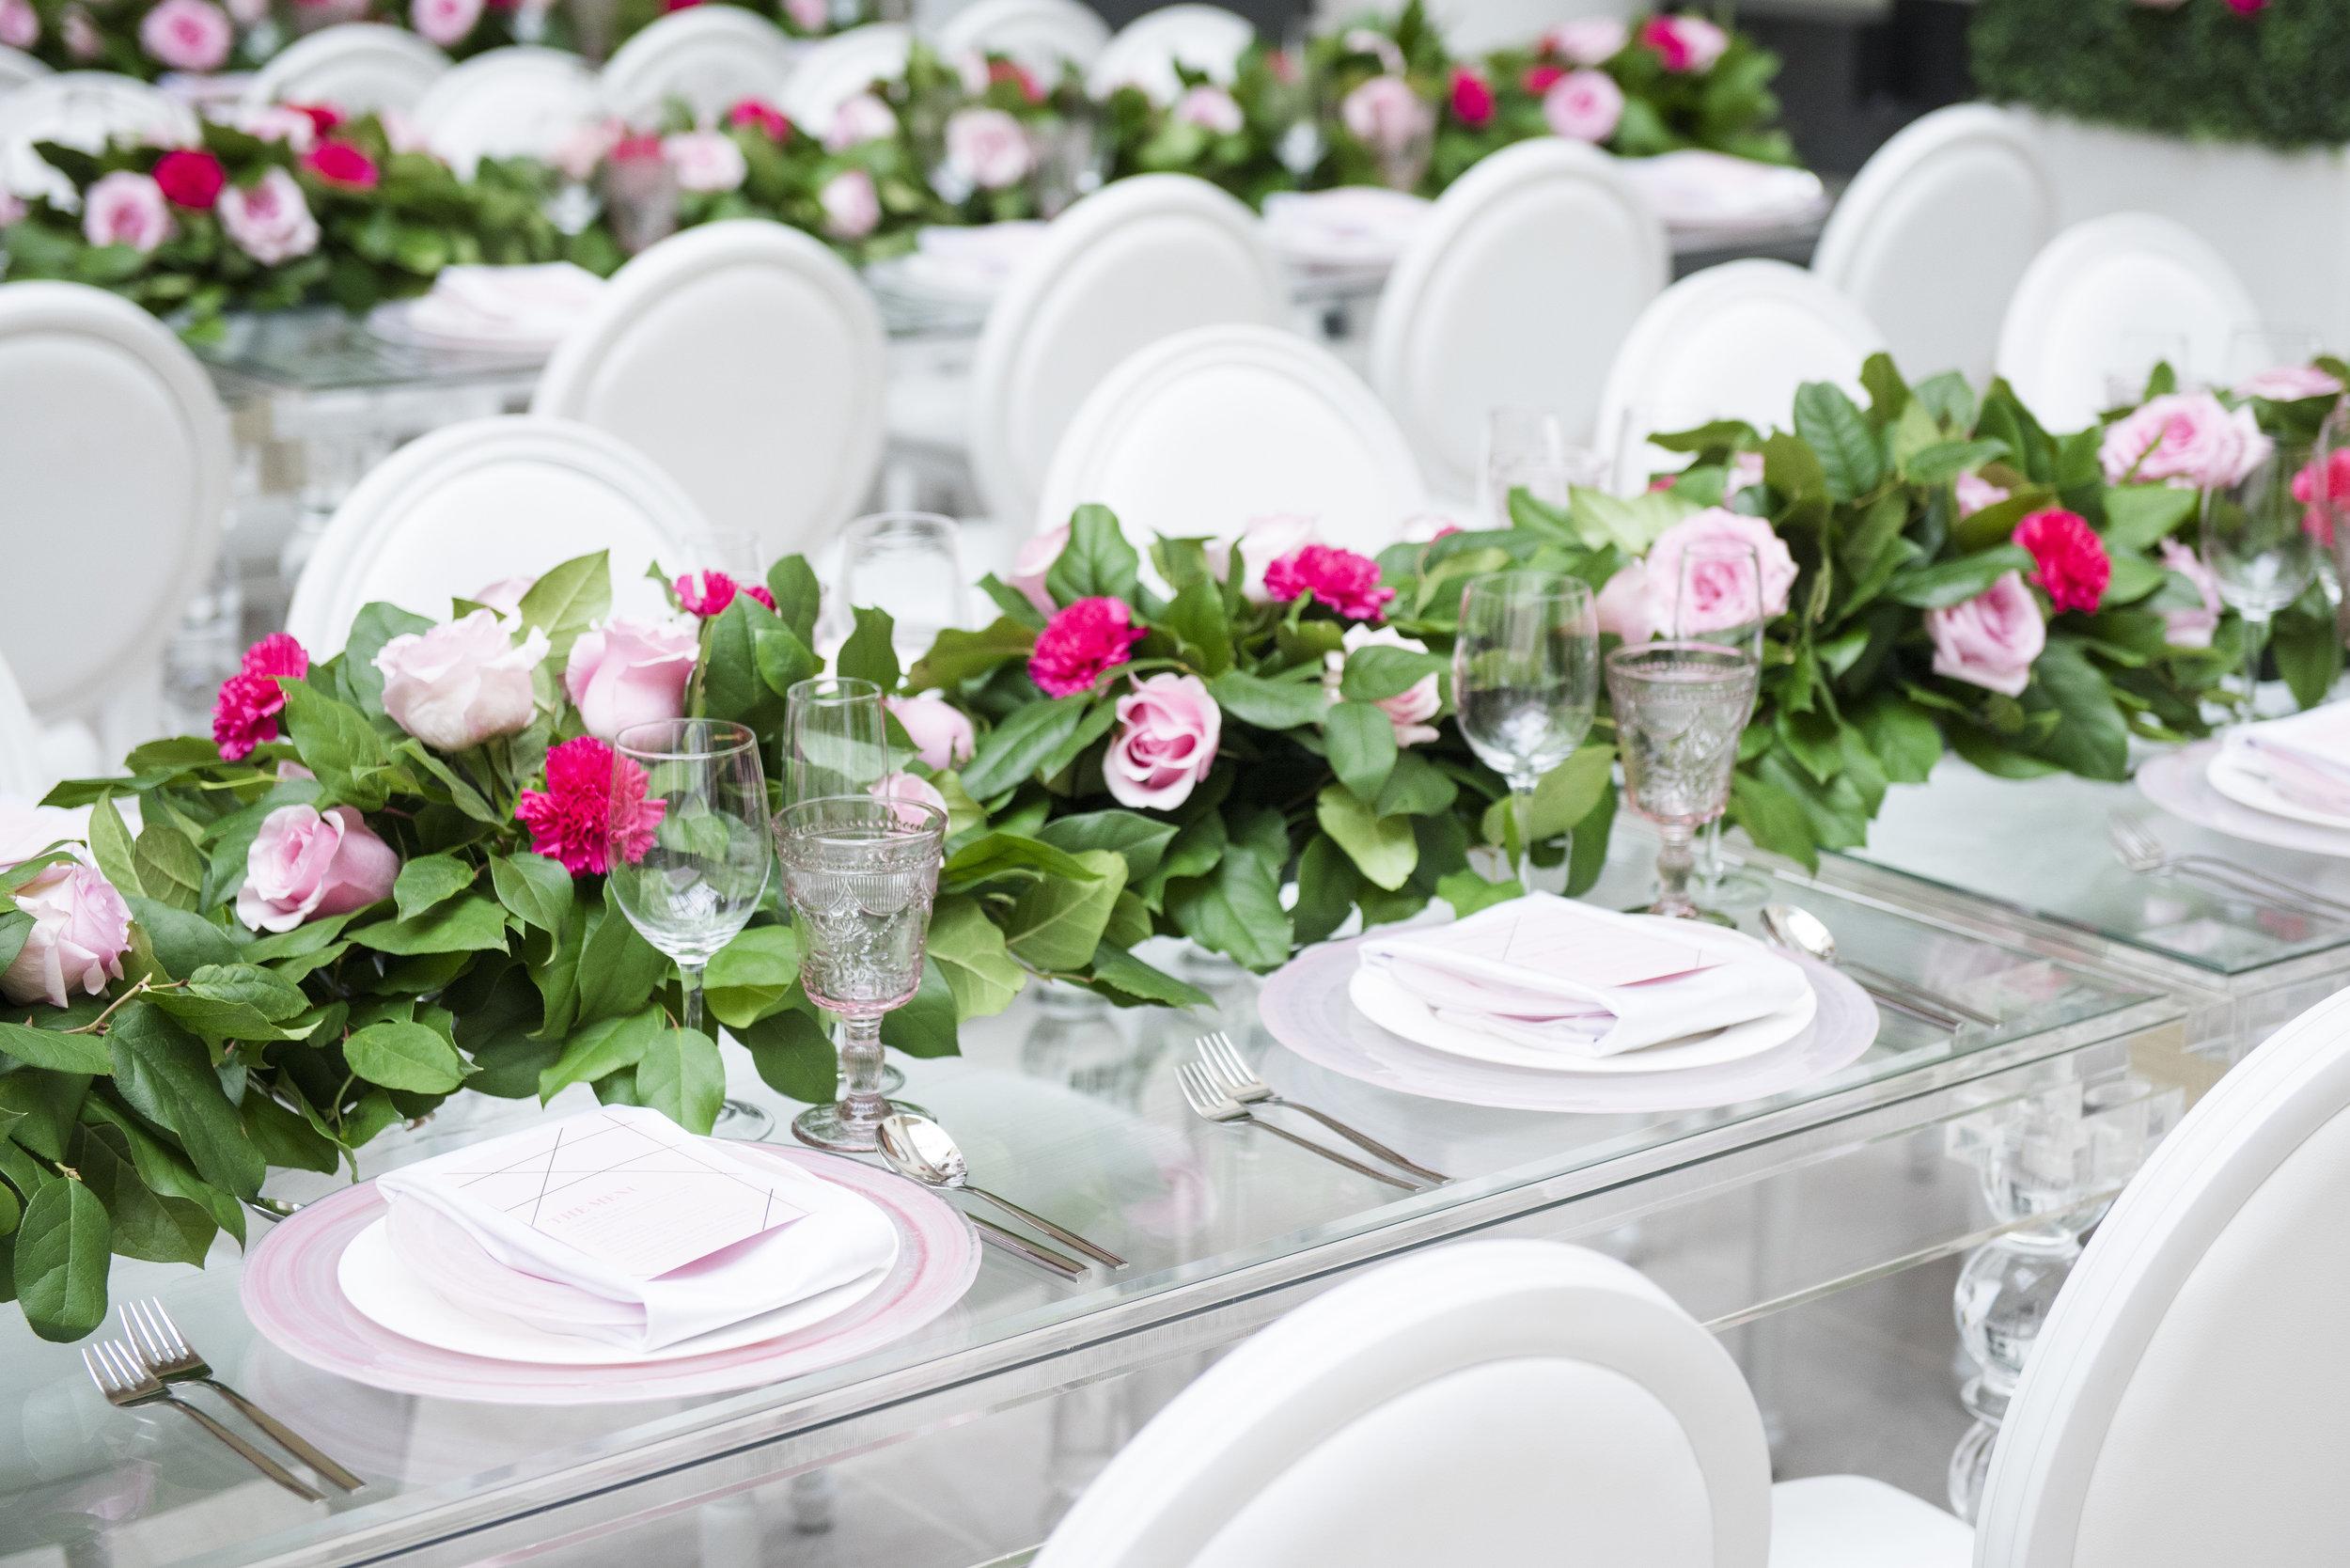 August In Bloom - Garden reception - Dior Darling (Wedluxe)